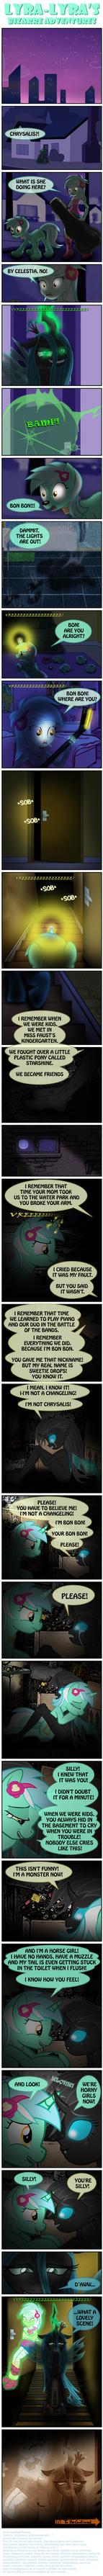 Lyra-Lyra's Bizarre Adventures (Part-102 1/2) by PONYMAAN